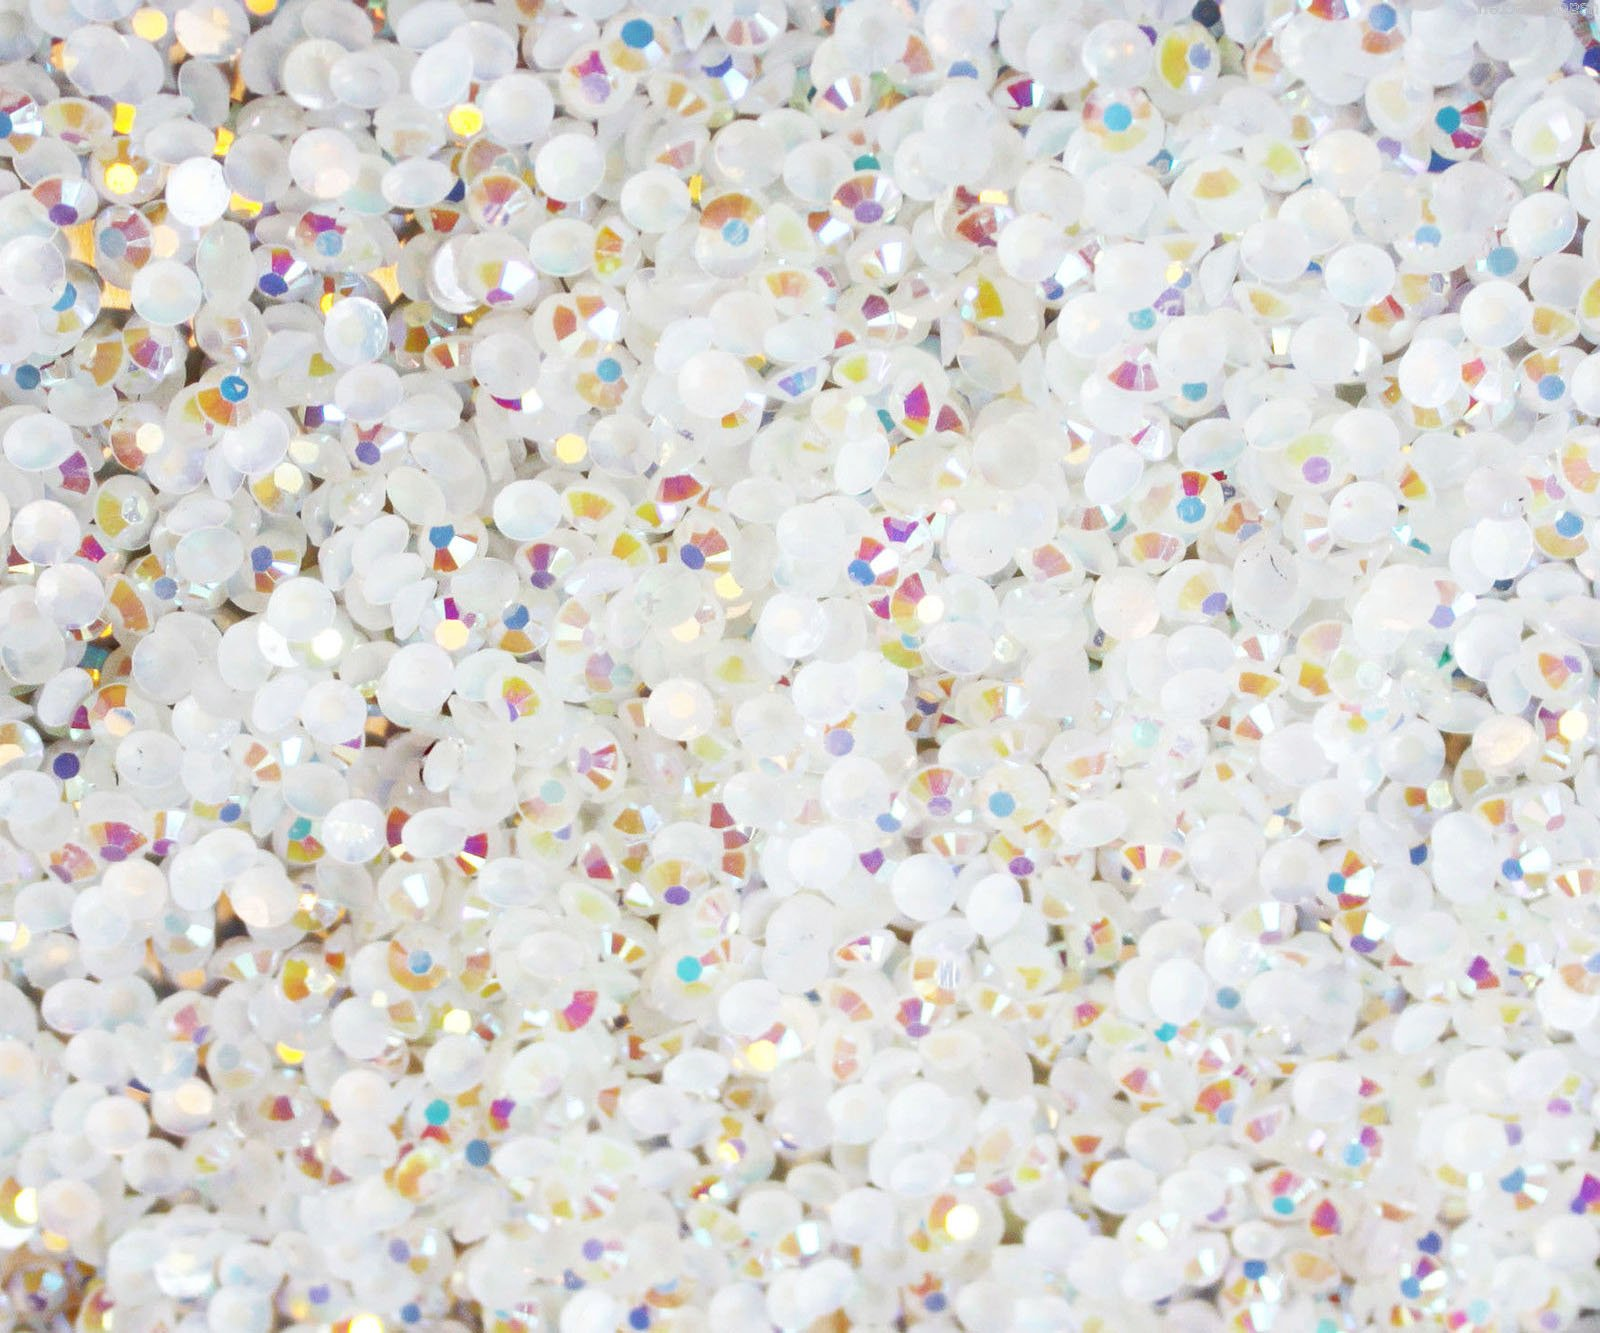 "100% Custom Made (4mm) 1000 Bulk Pieces of Mini Size ""Glue-On"" Flatback Embellishments for Decorating, Made of Acrylic Resin w/ Shiny Iridescent Crafting Rhinestone Crystal Iced Diamond Style {White}"